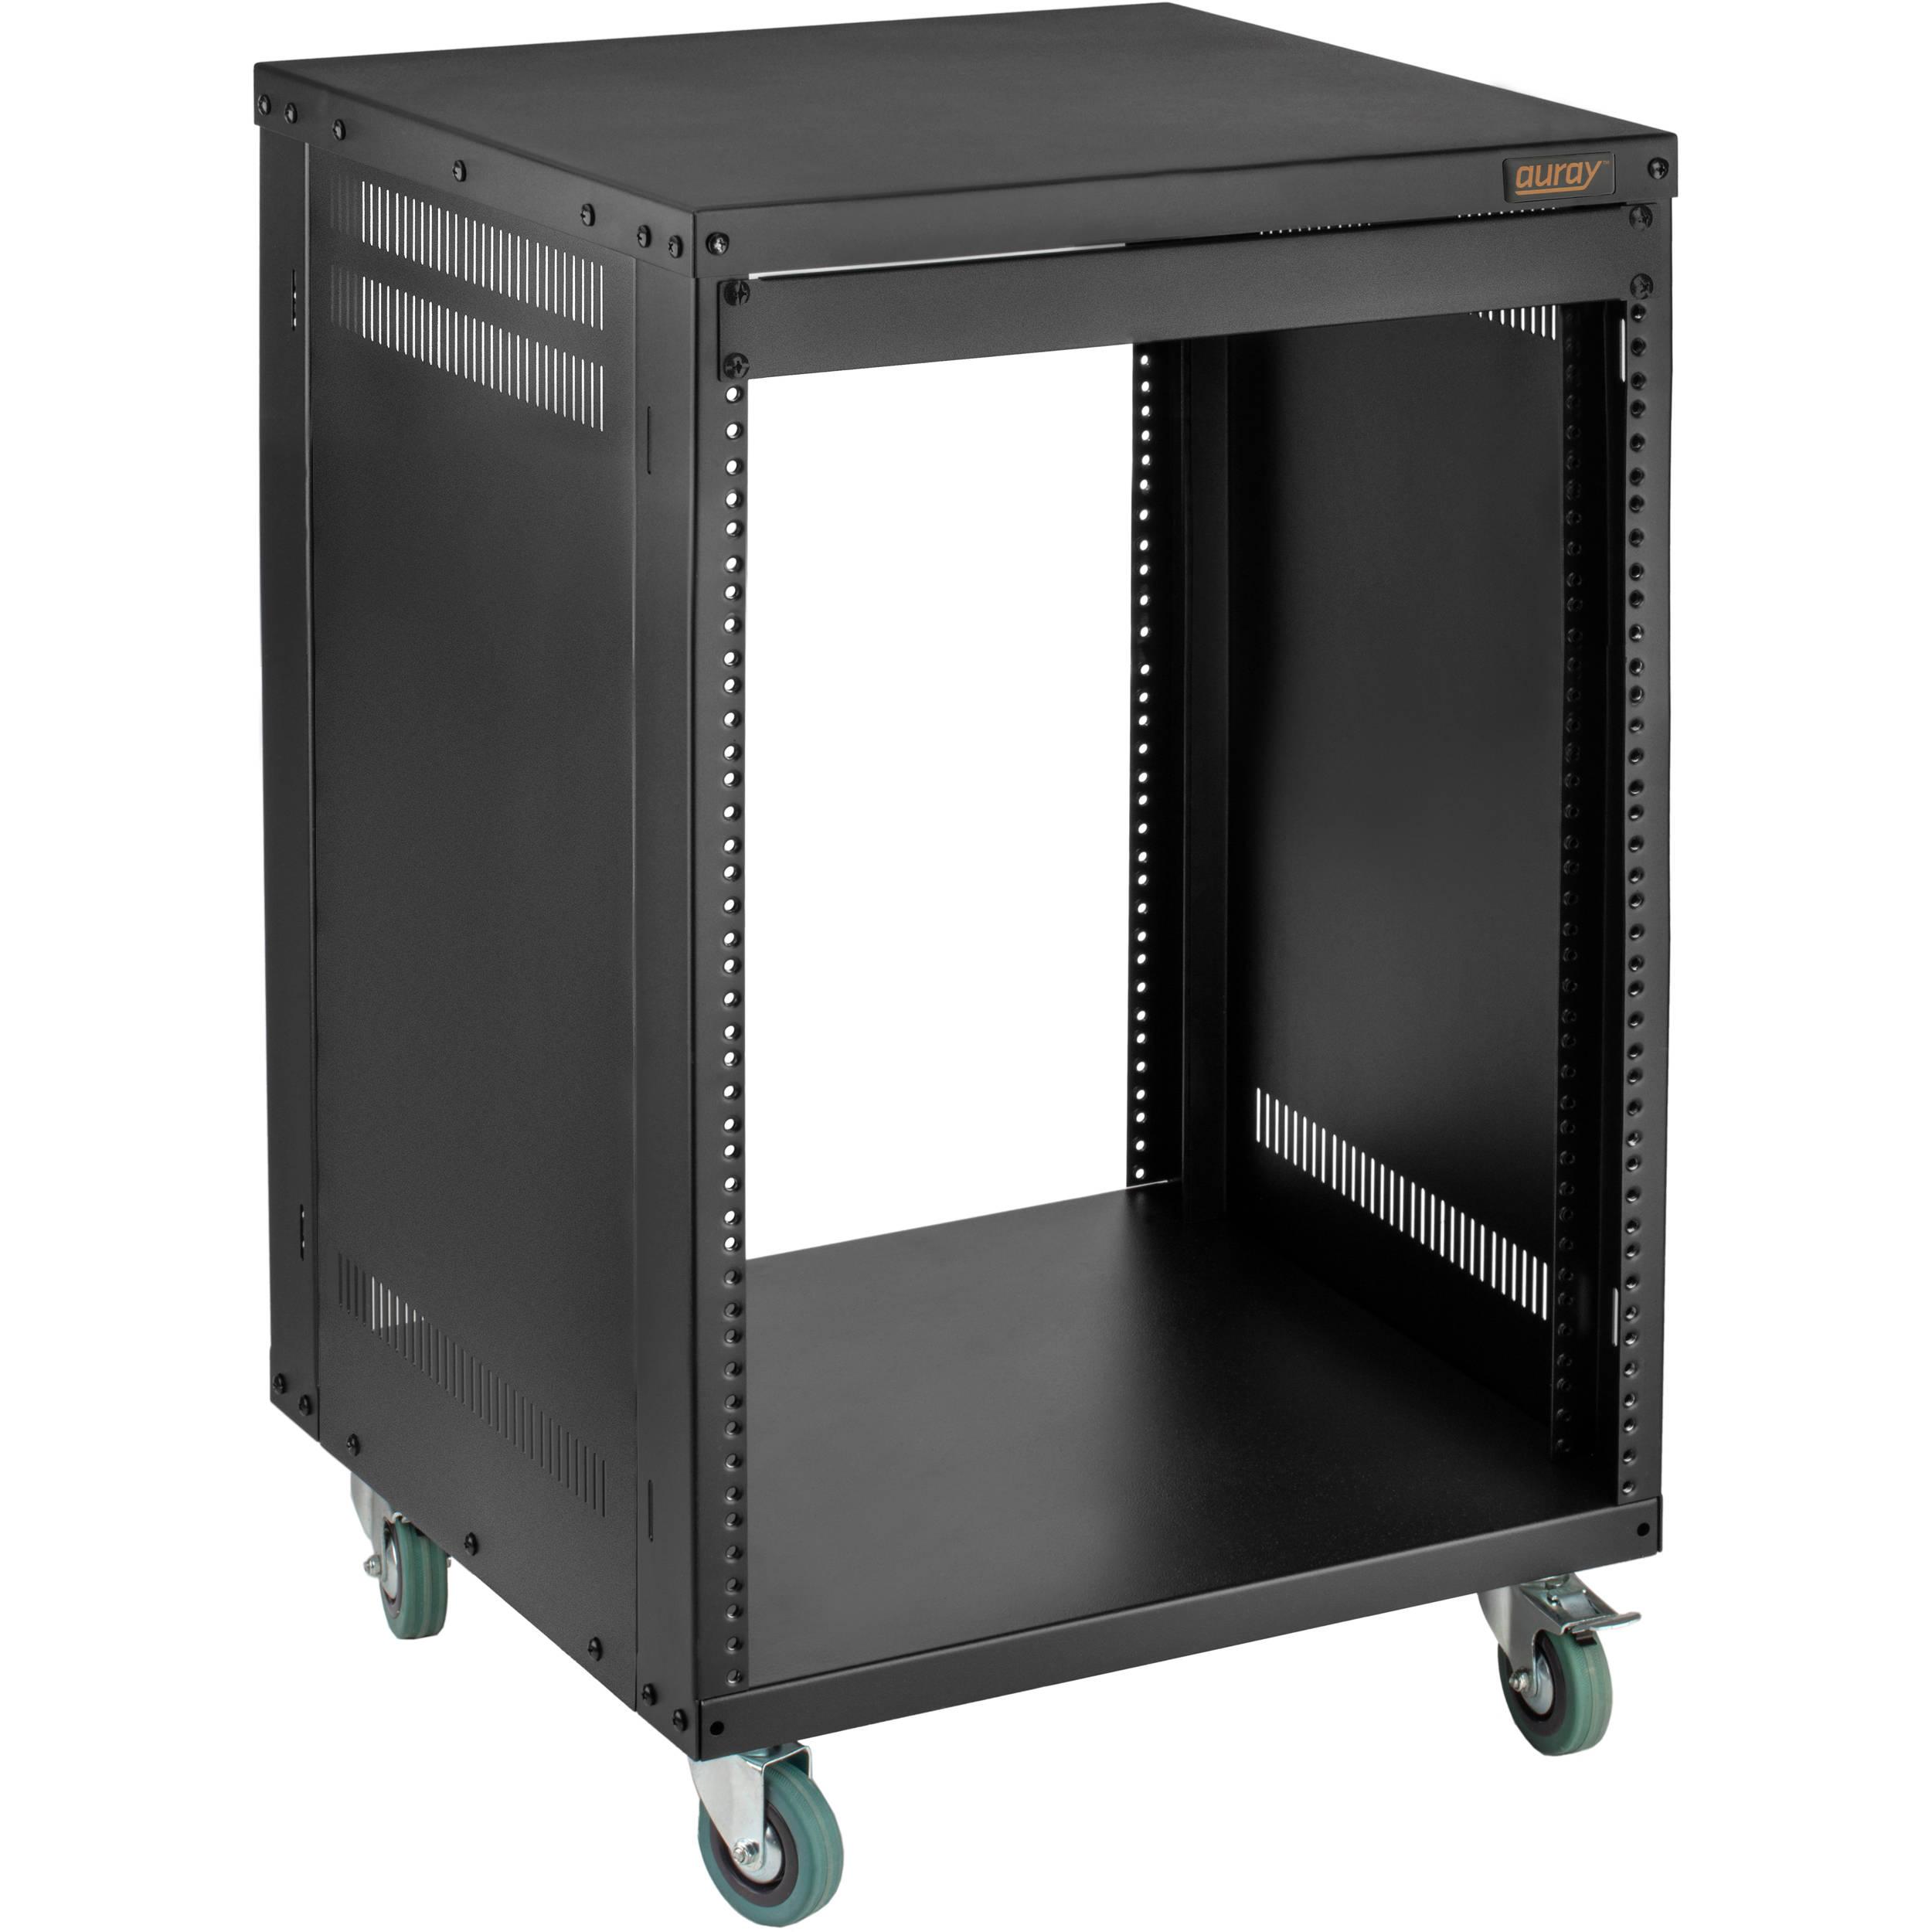 auray ers 12u steel equipment rack with 3 casters 12 ru